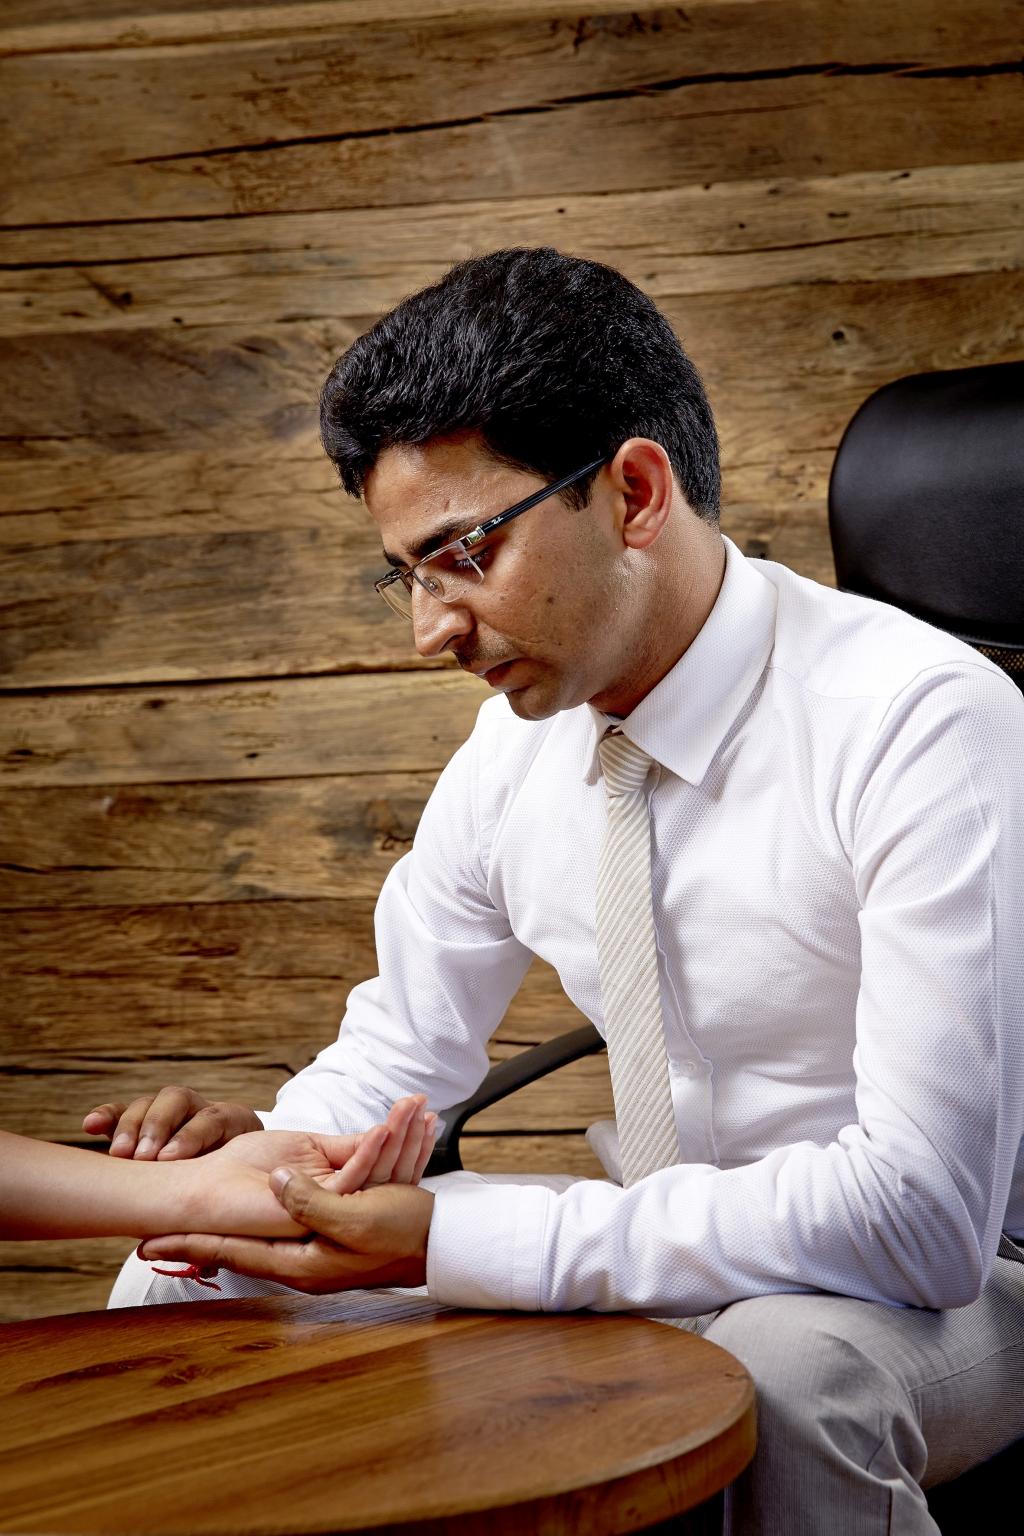 Ayurveda-Spezialist Gaurav Sharma nimmt traditionelle Pulsdiagnose